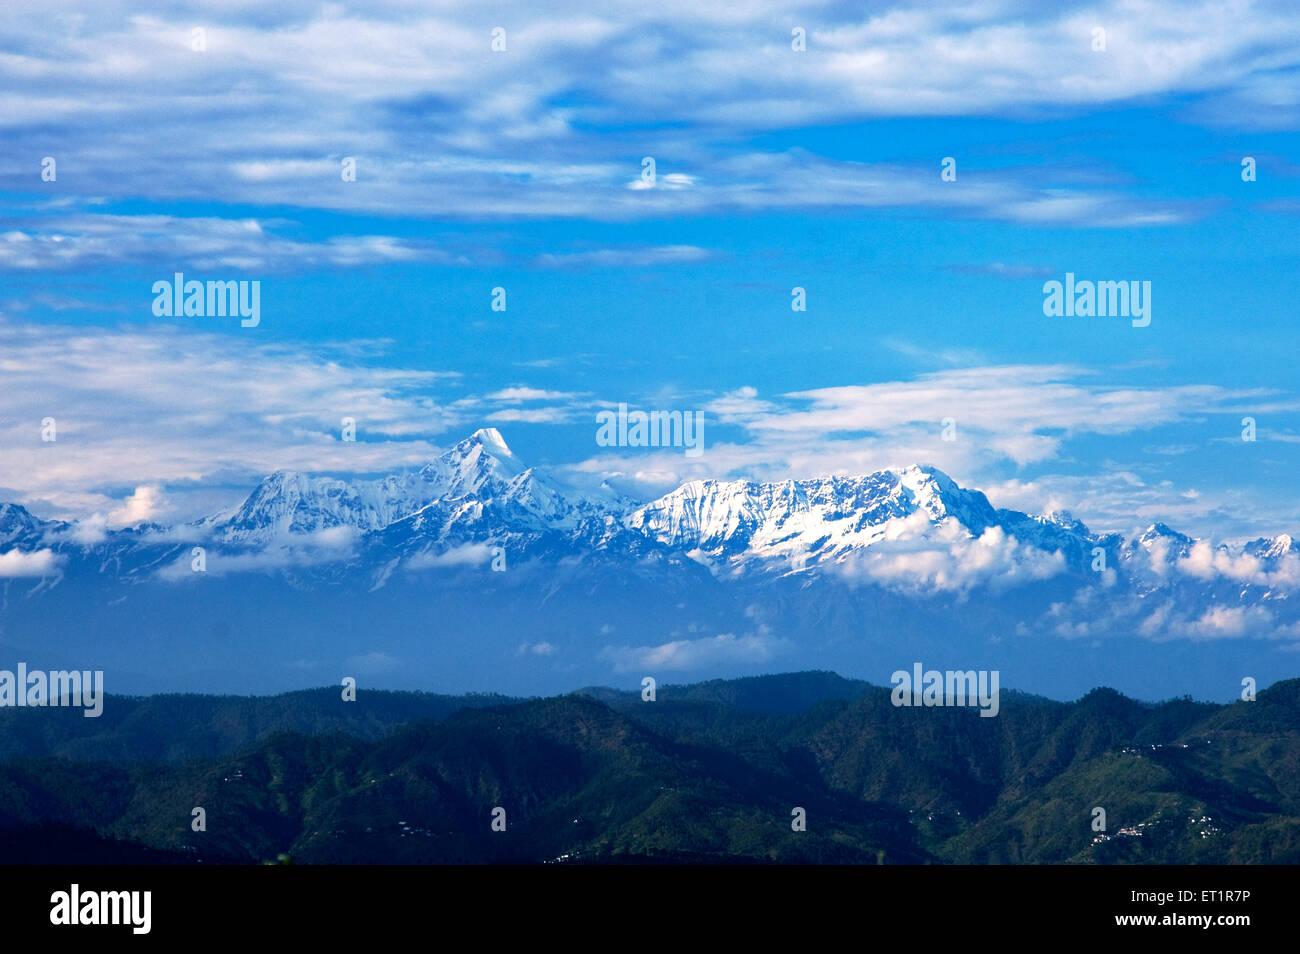 Des sommets enneigés de l'himalaya Asie Inde uttarakhand Photo Stock